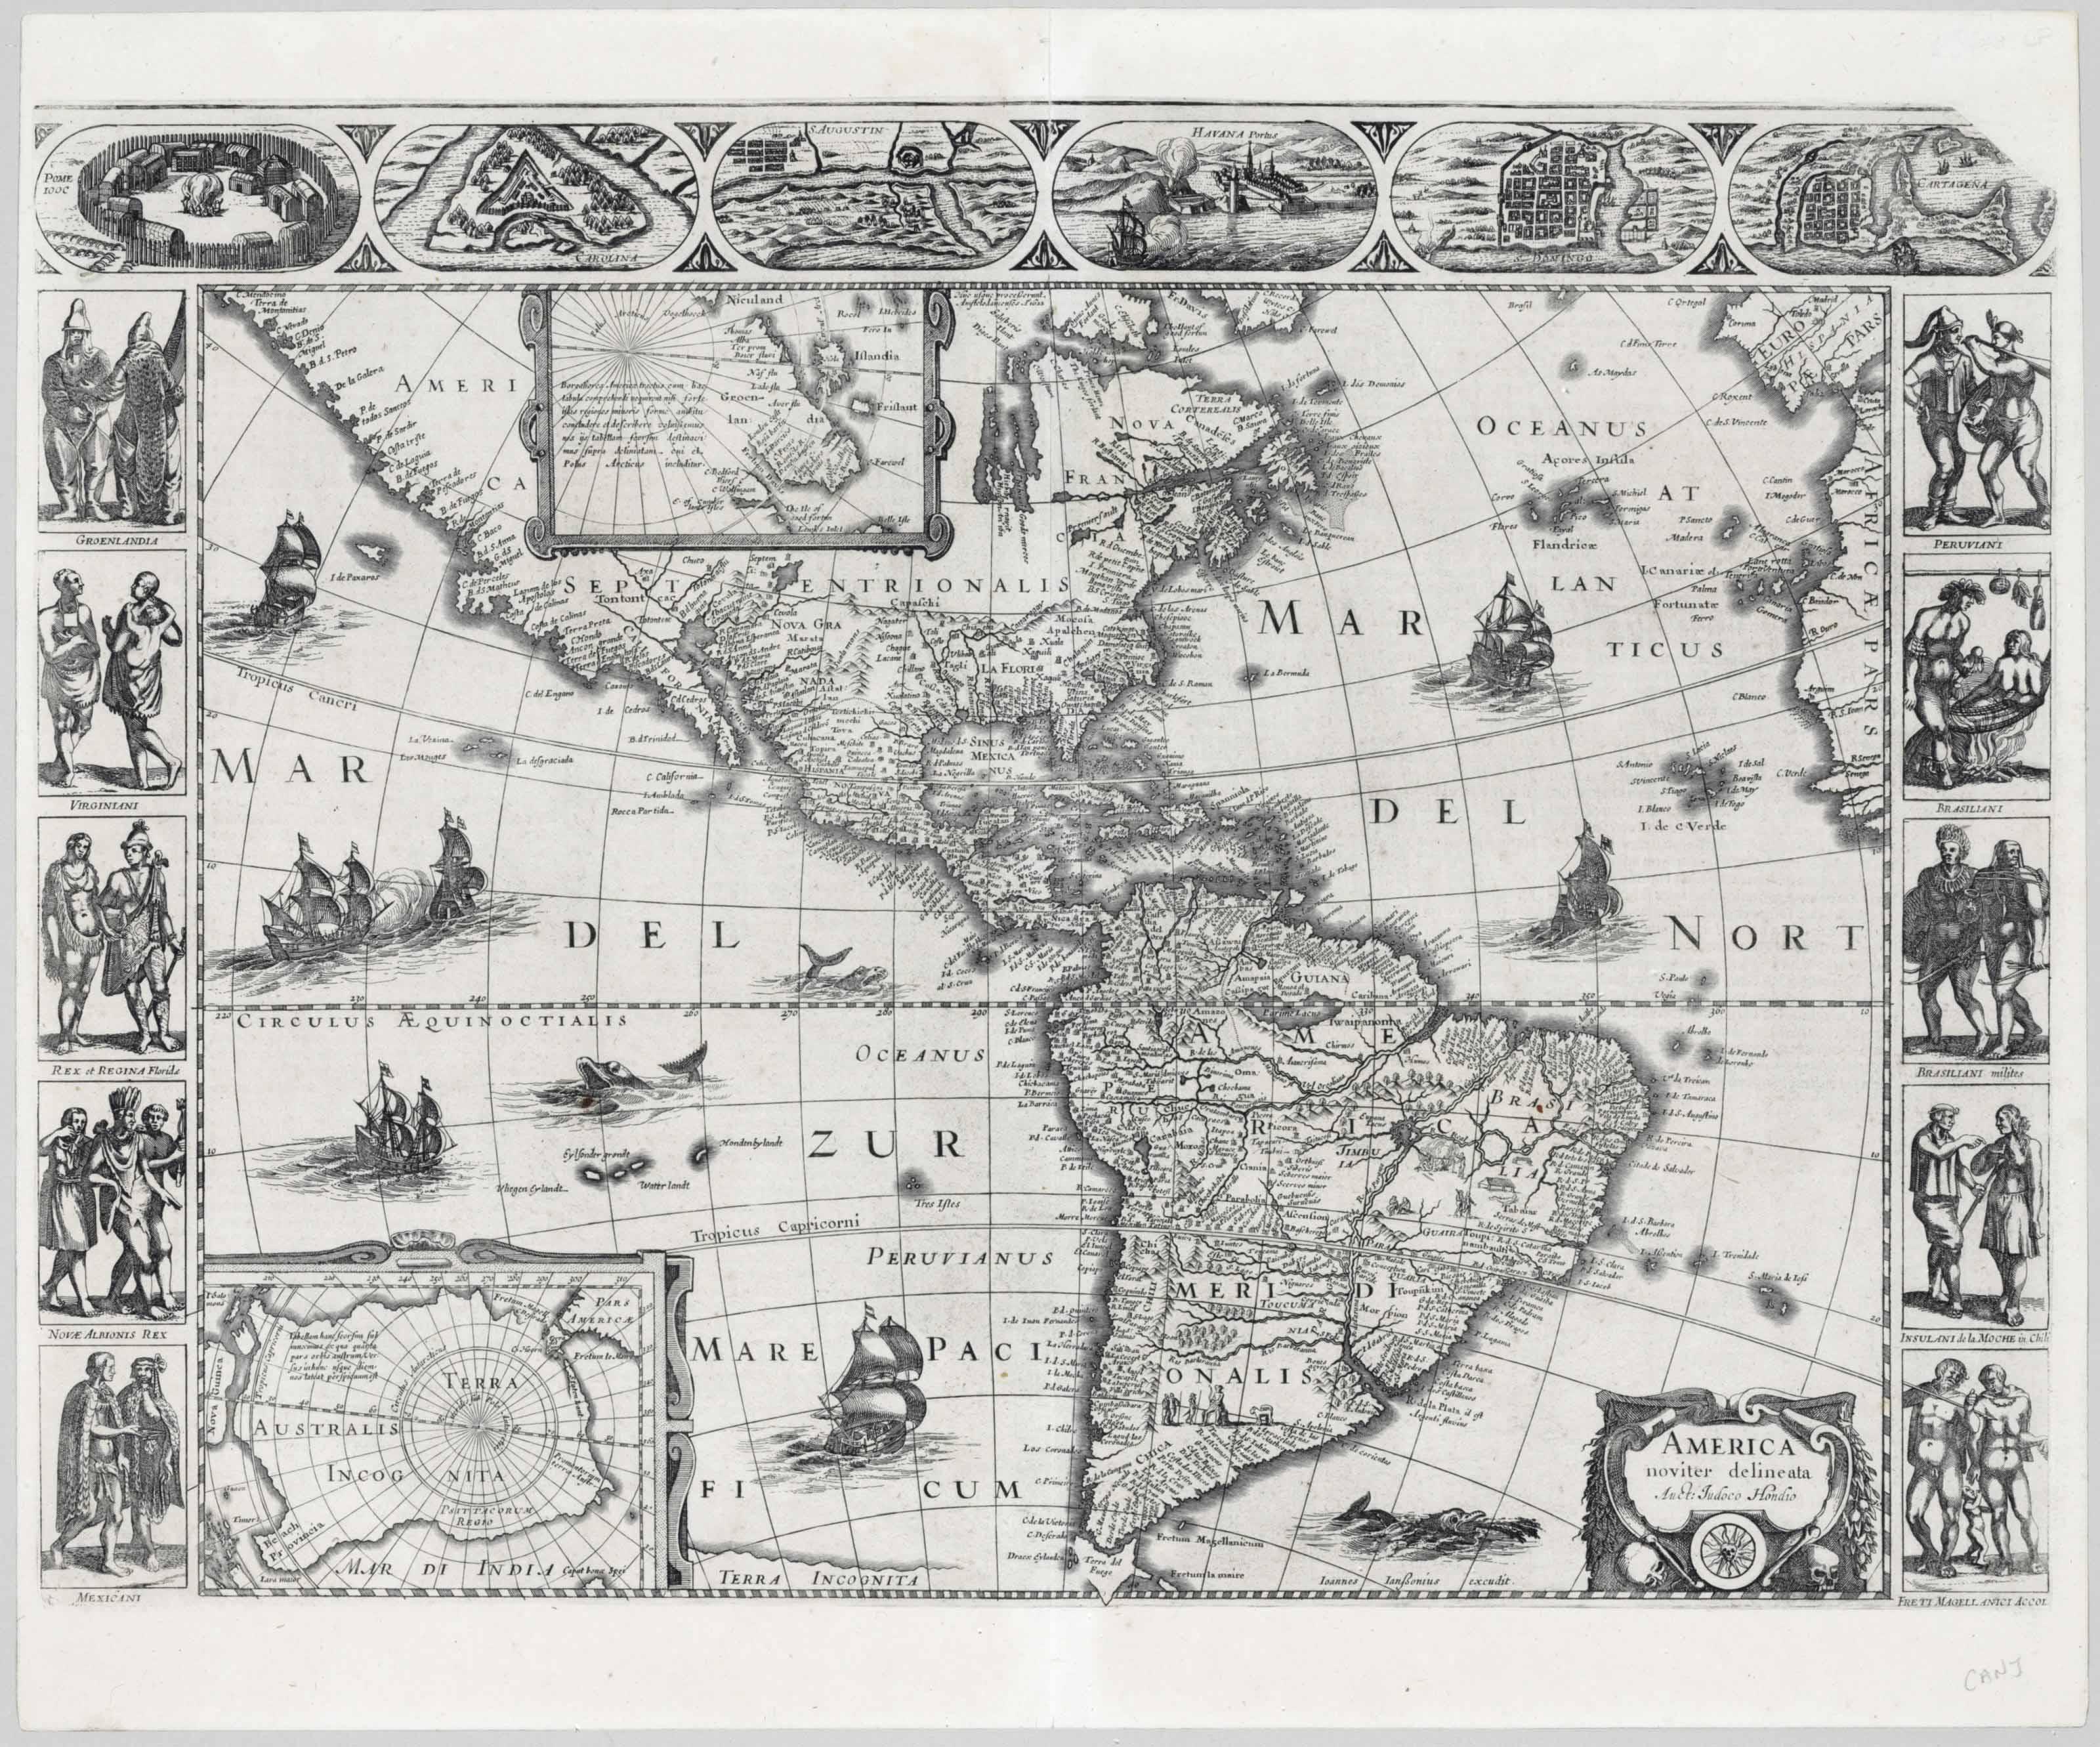 JANSSON, Joannes (1588-1664) and Henricus HONDIUS (1597-1651). America noviter delineata. [Amsterdam:] 1632 [or later].